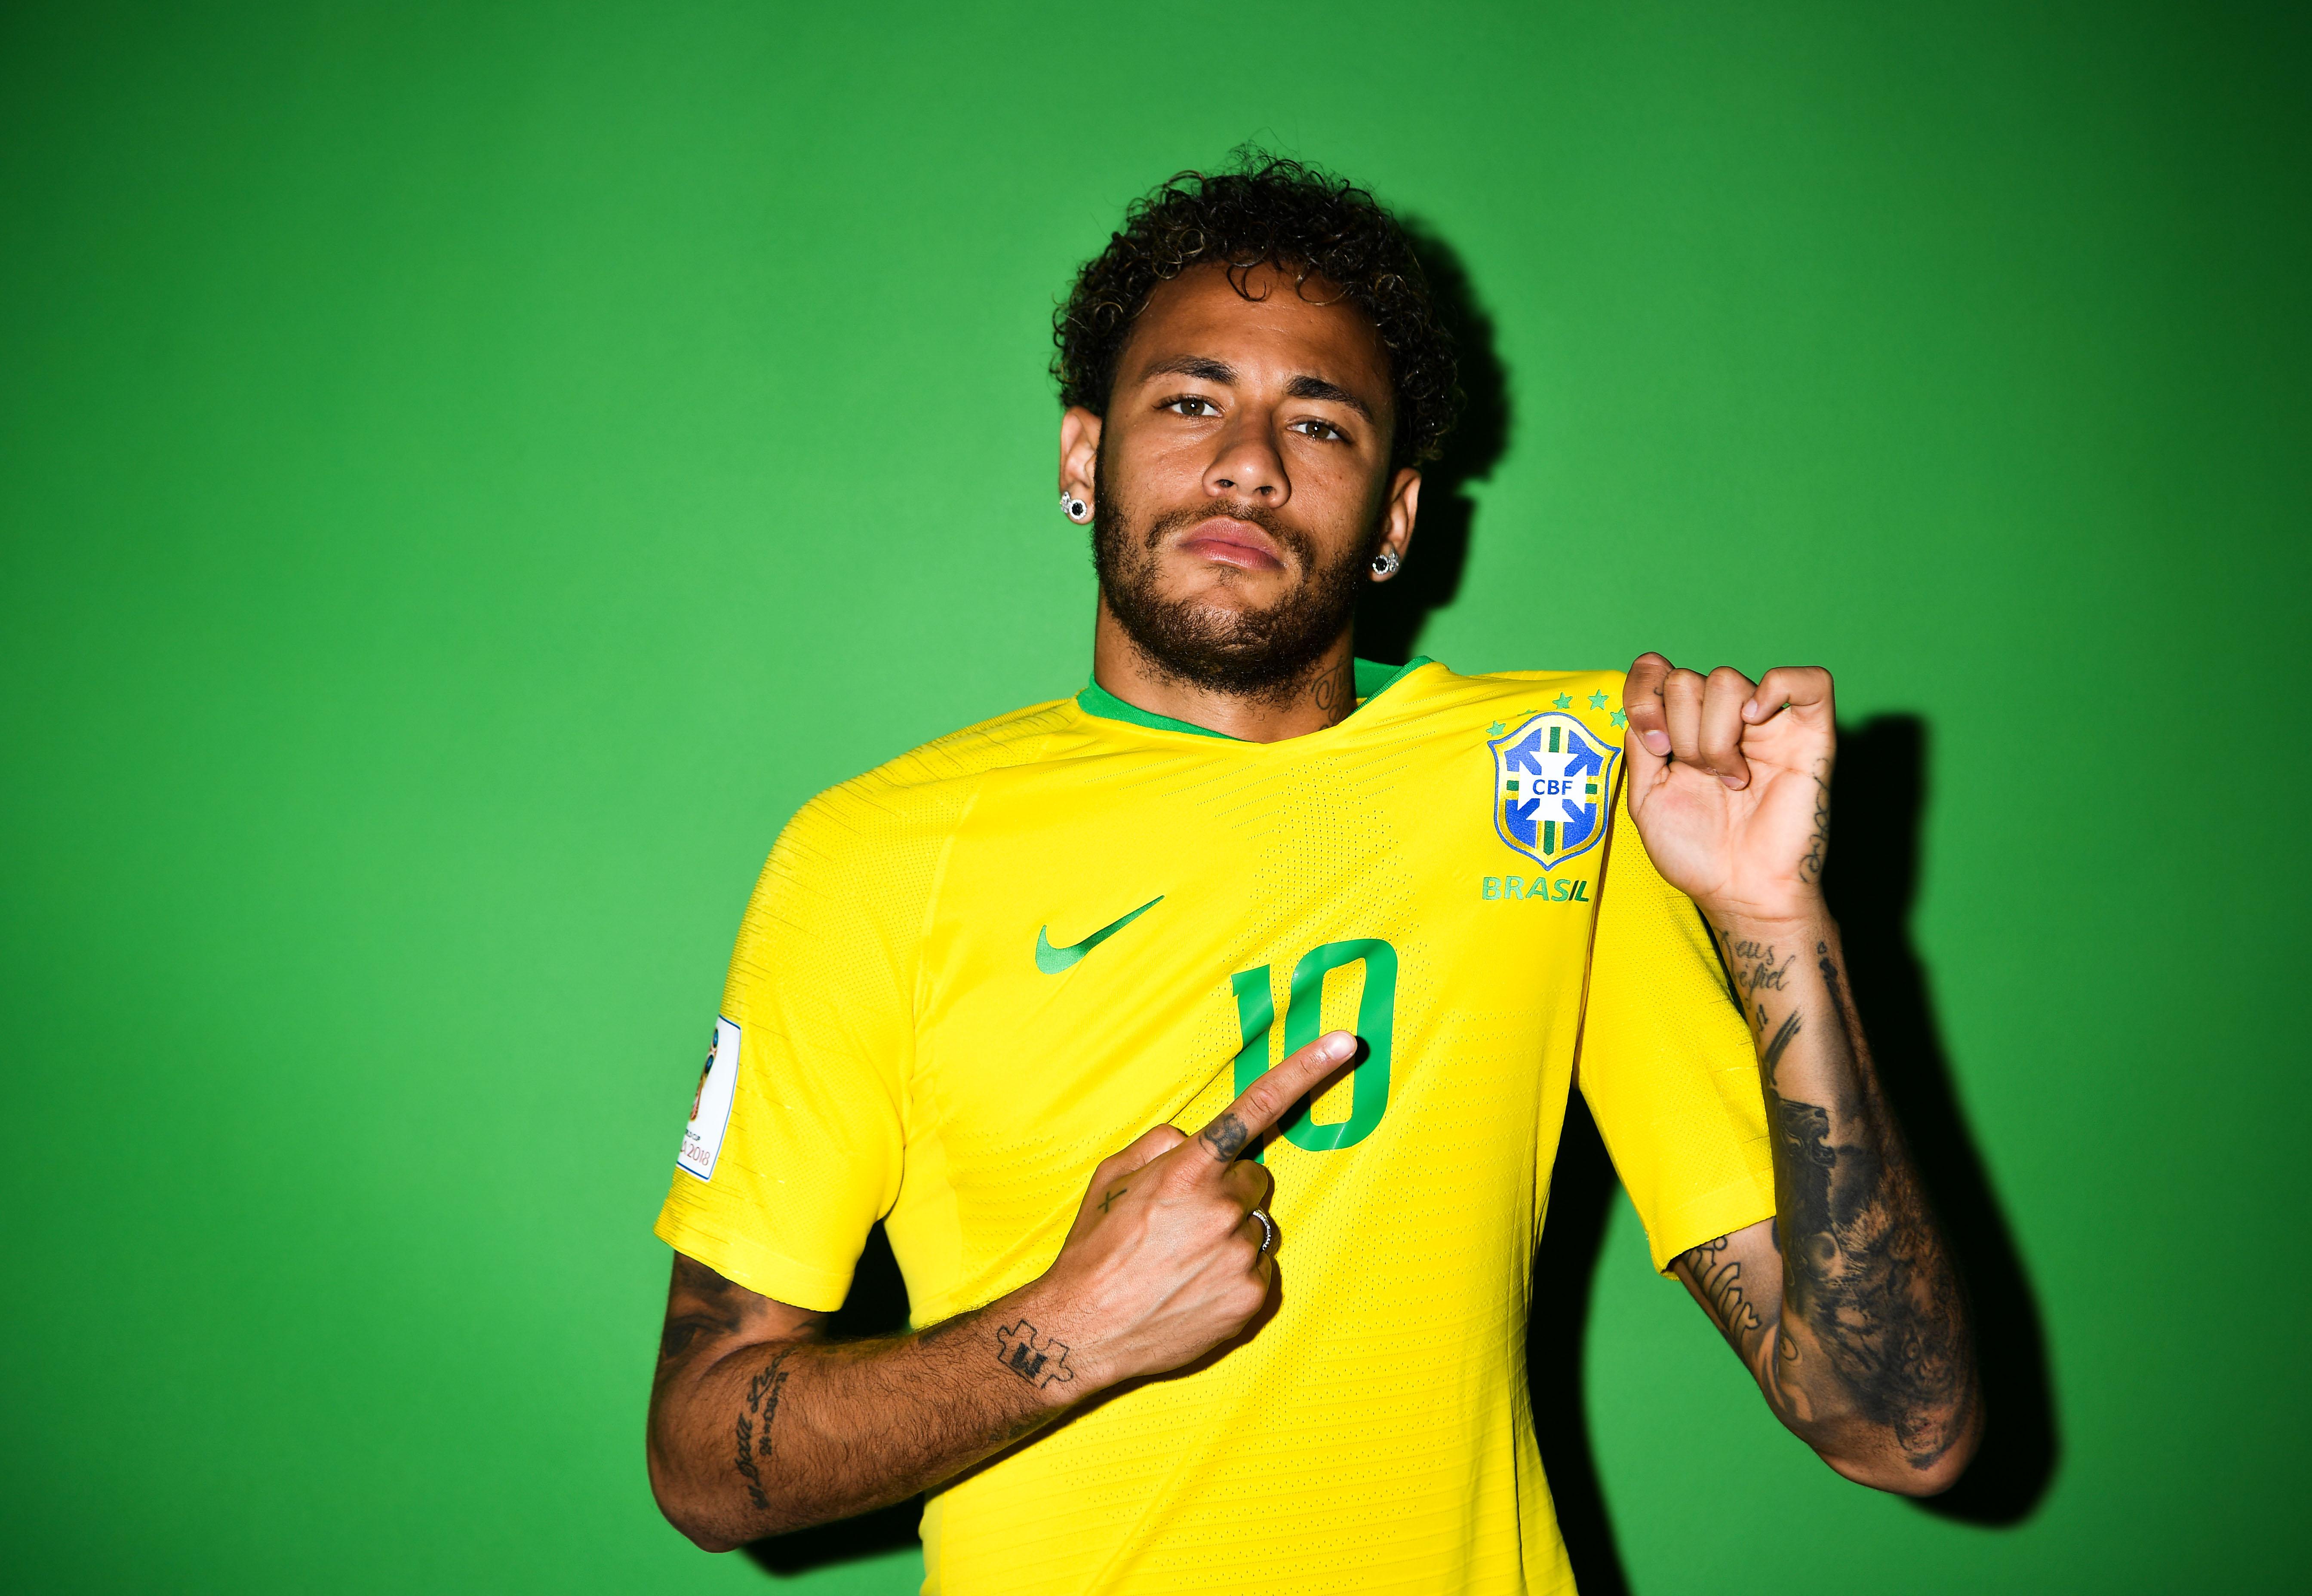 5120x2880 Neymar Jr Brazil Portraits 5k HD 4k Wallpapers ...